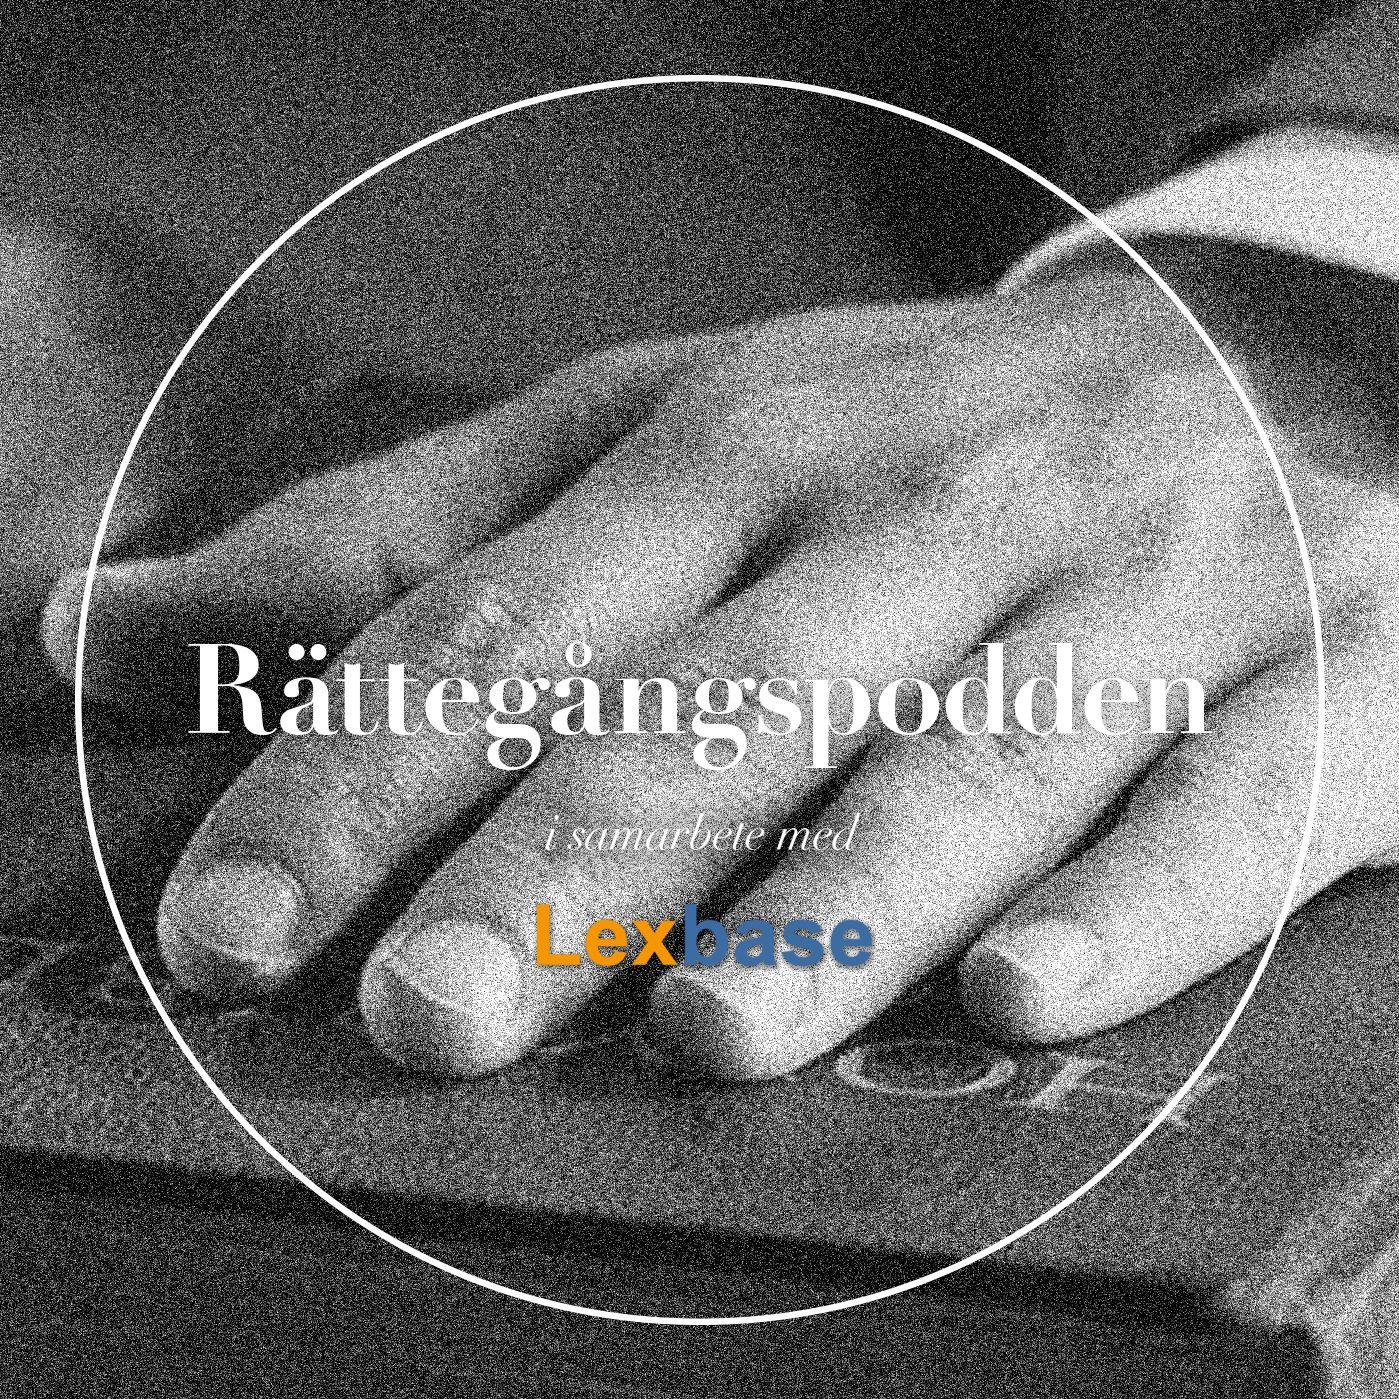 S04E06 Dödsskjutningen i Katrineholm - Del 2/3